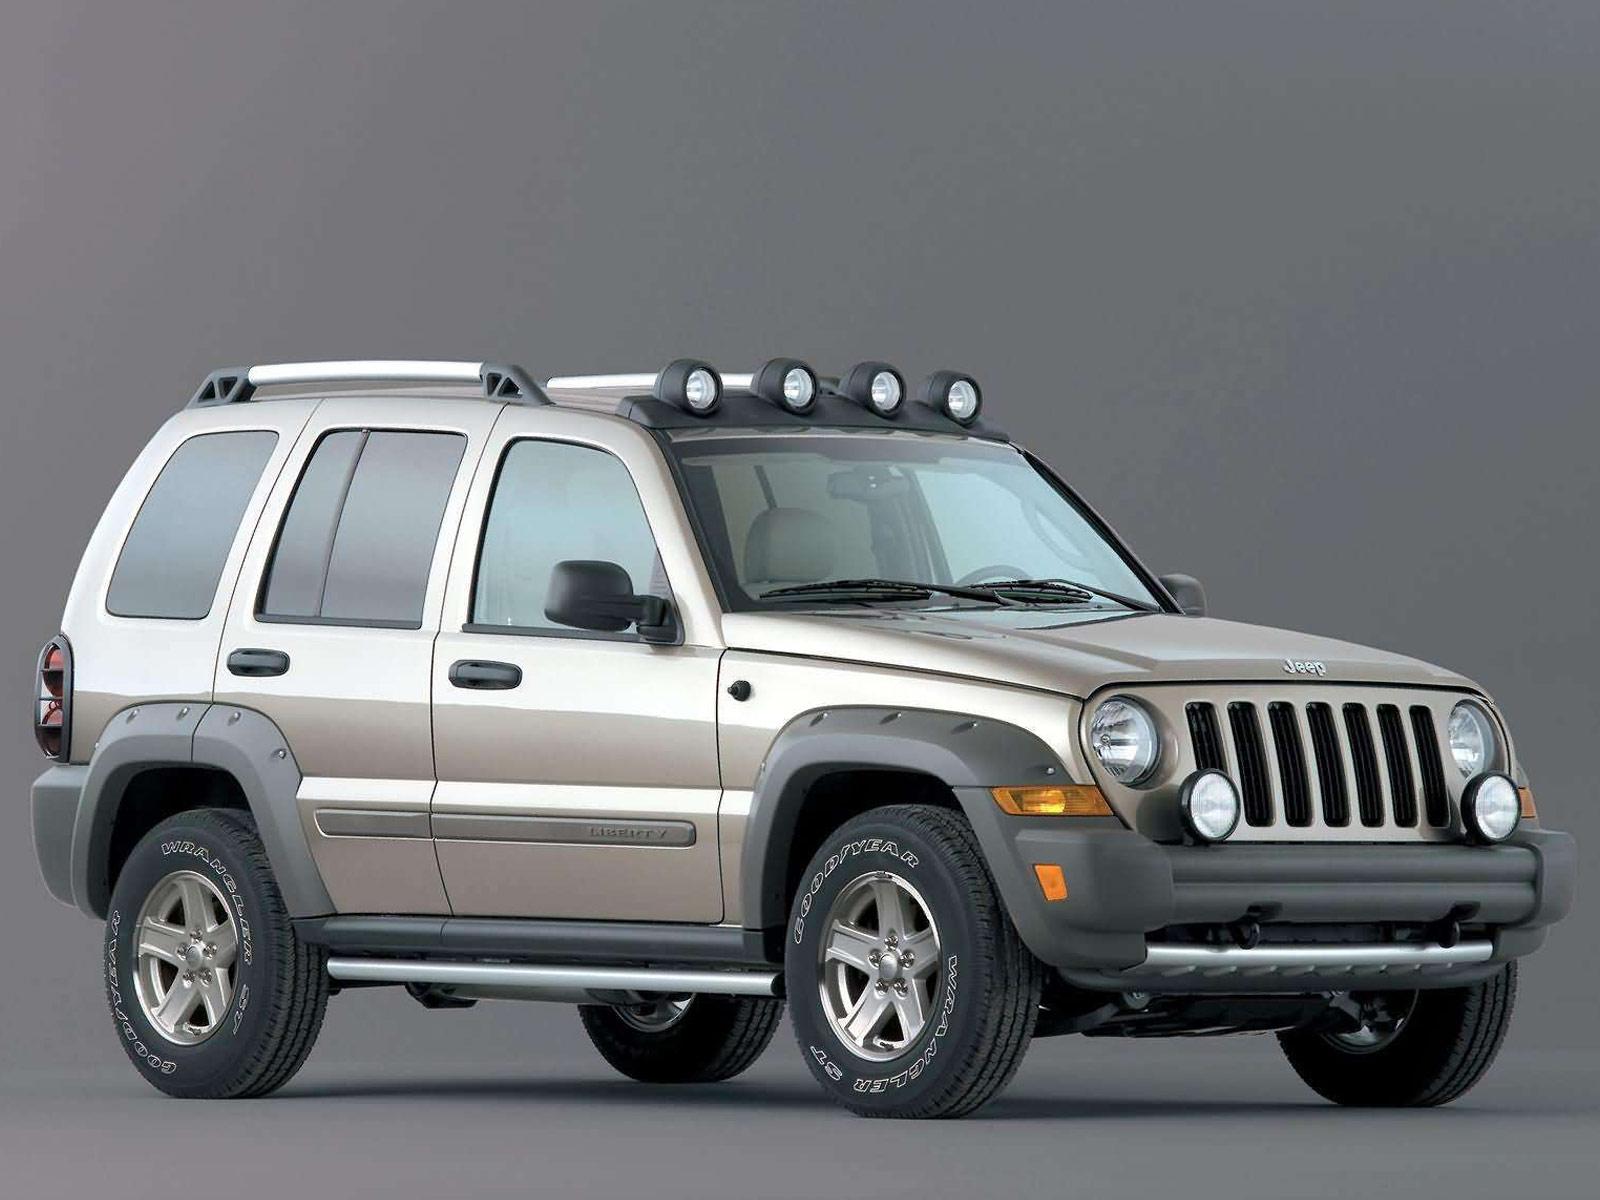 2005 Jeep Liberty Renegade 3 7